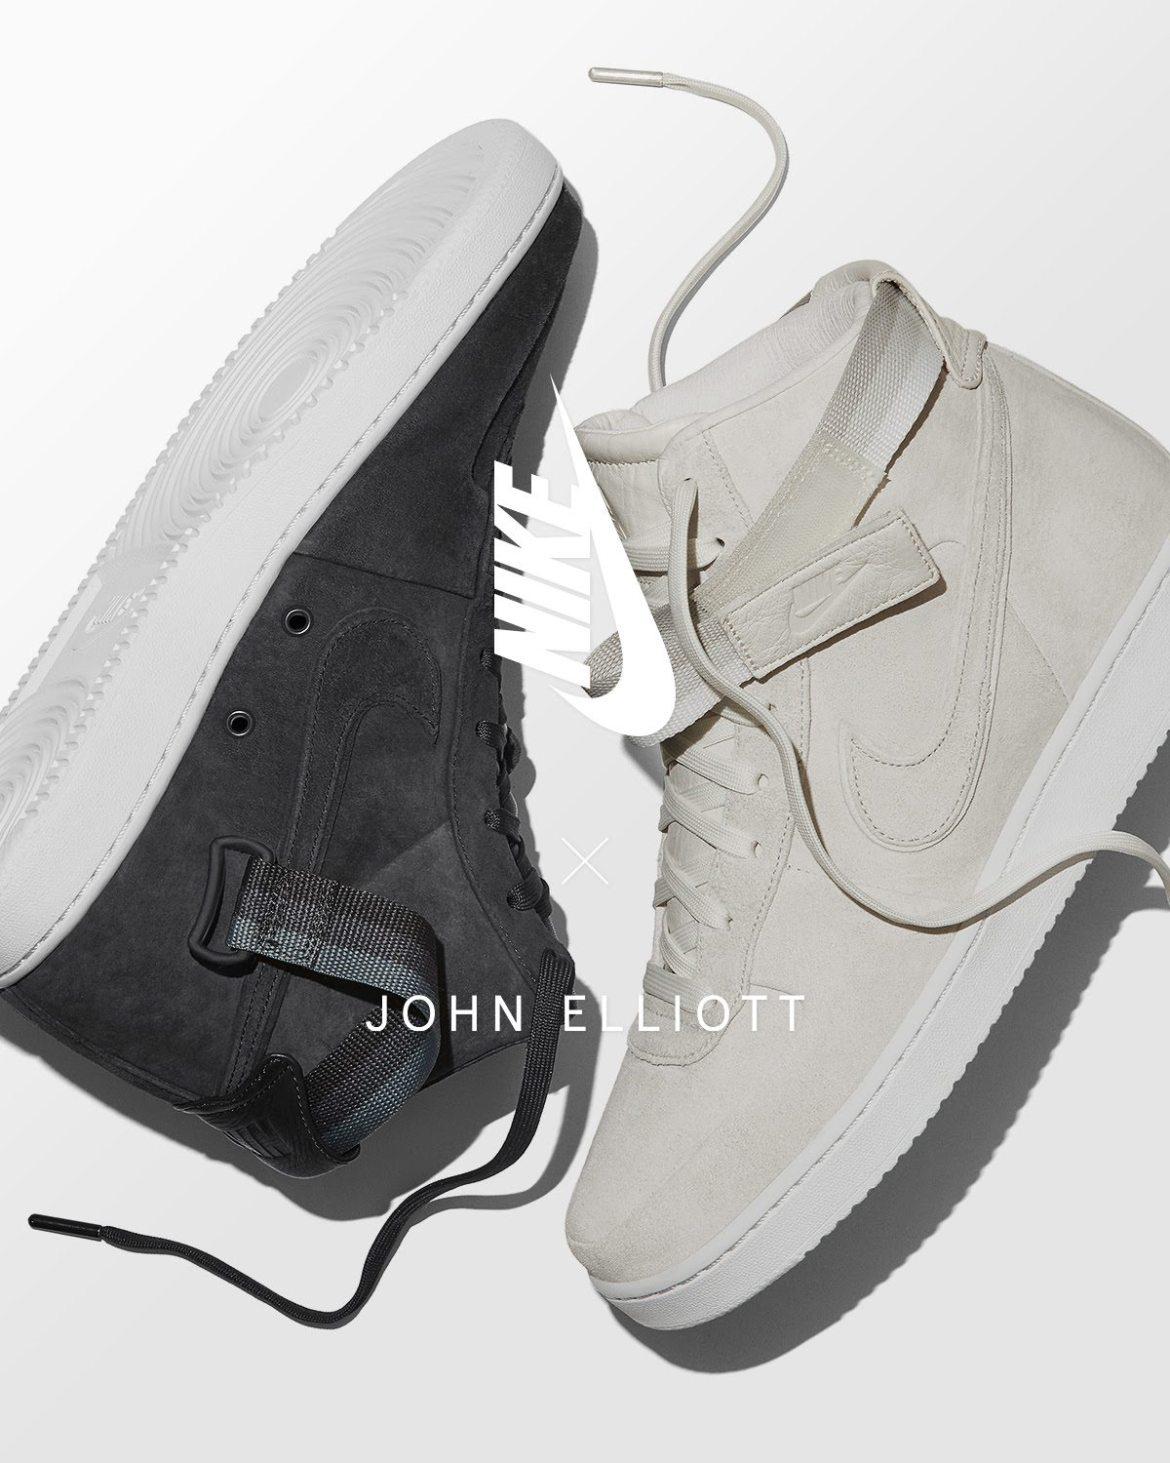 John Elliott x NikeLab Vandal